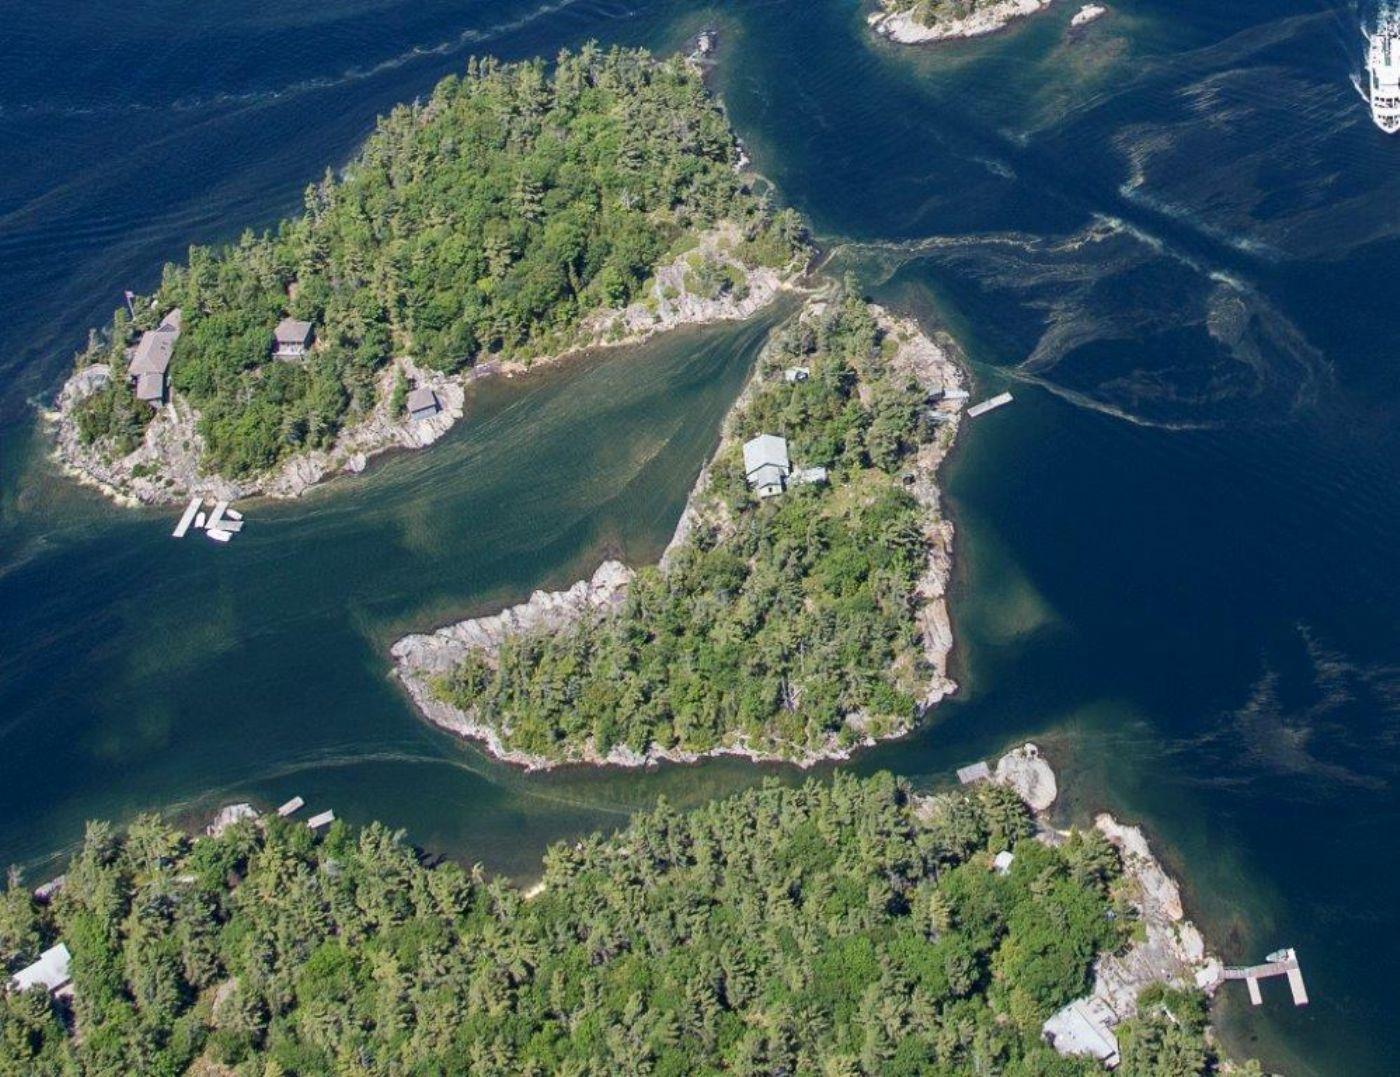 Coney Island Georgian Bay Islands For Sale Real Estate in ...